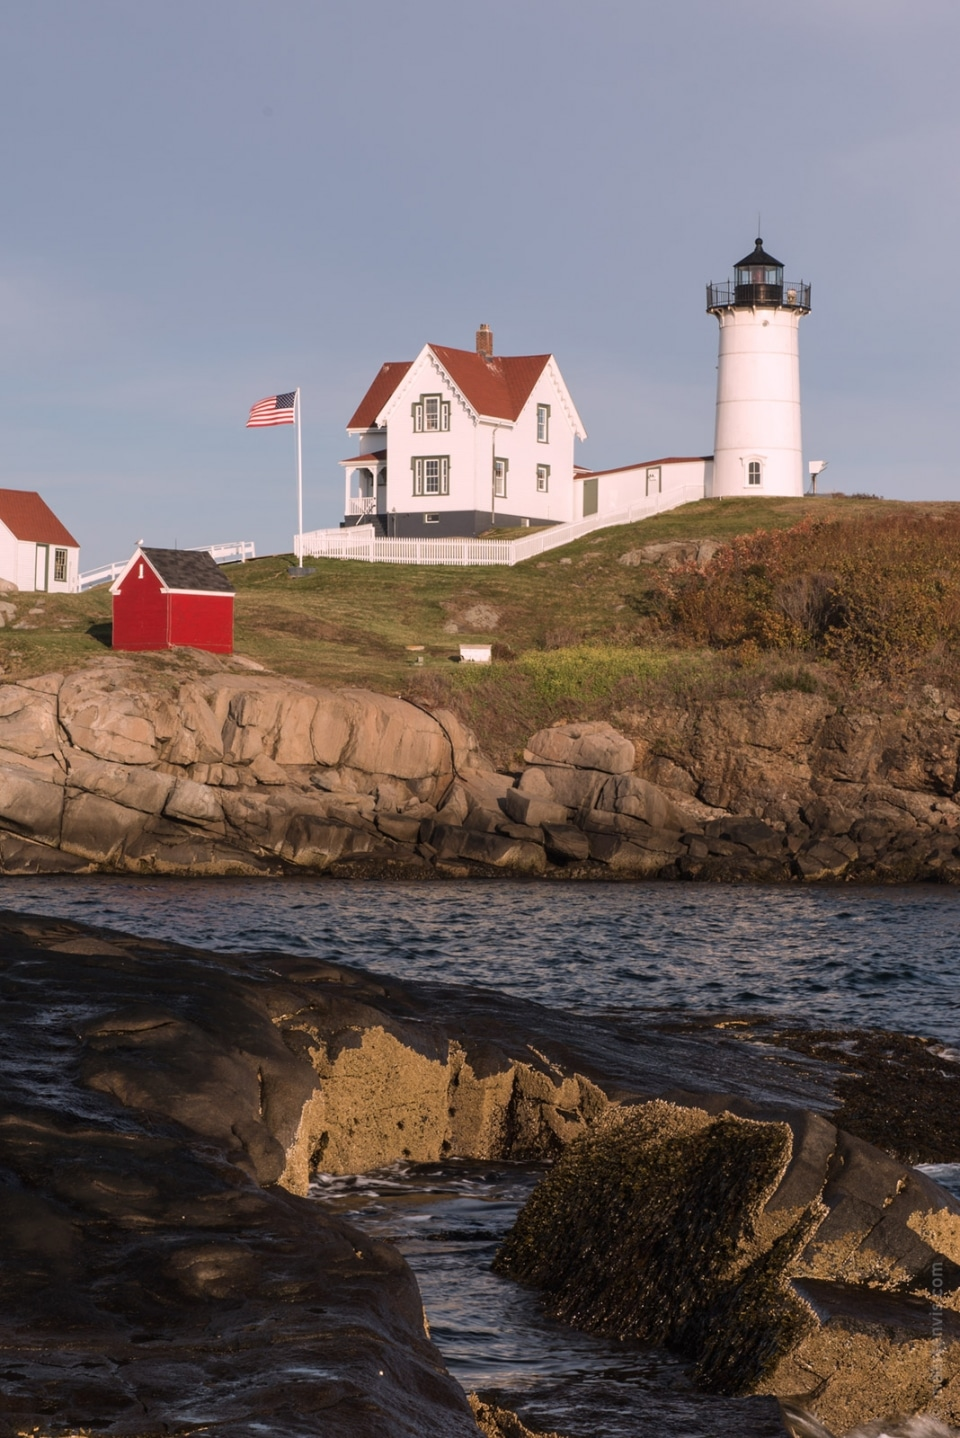 20131020 49111 960x1438 - Along the Maine Coast